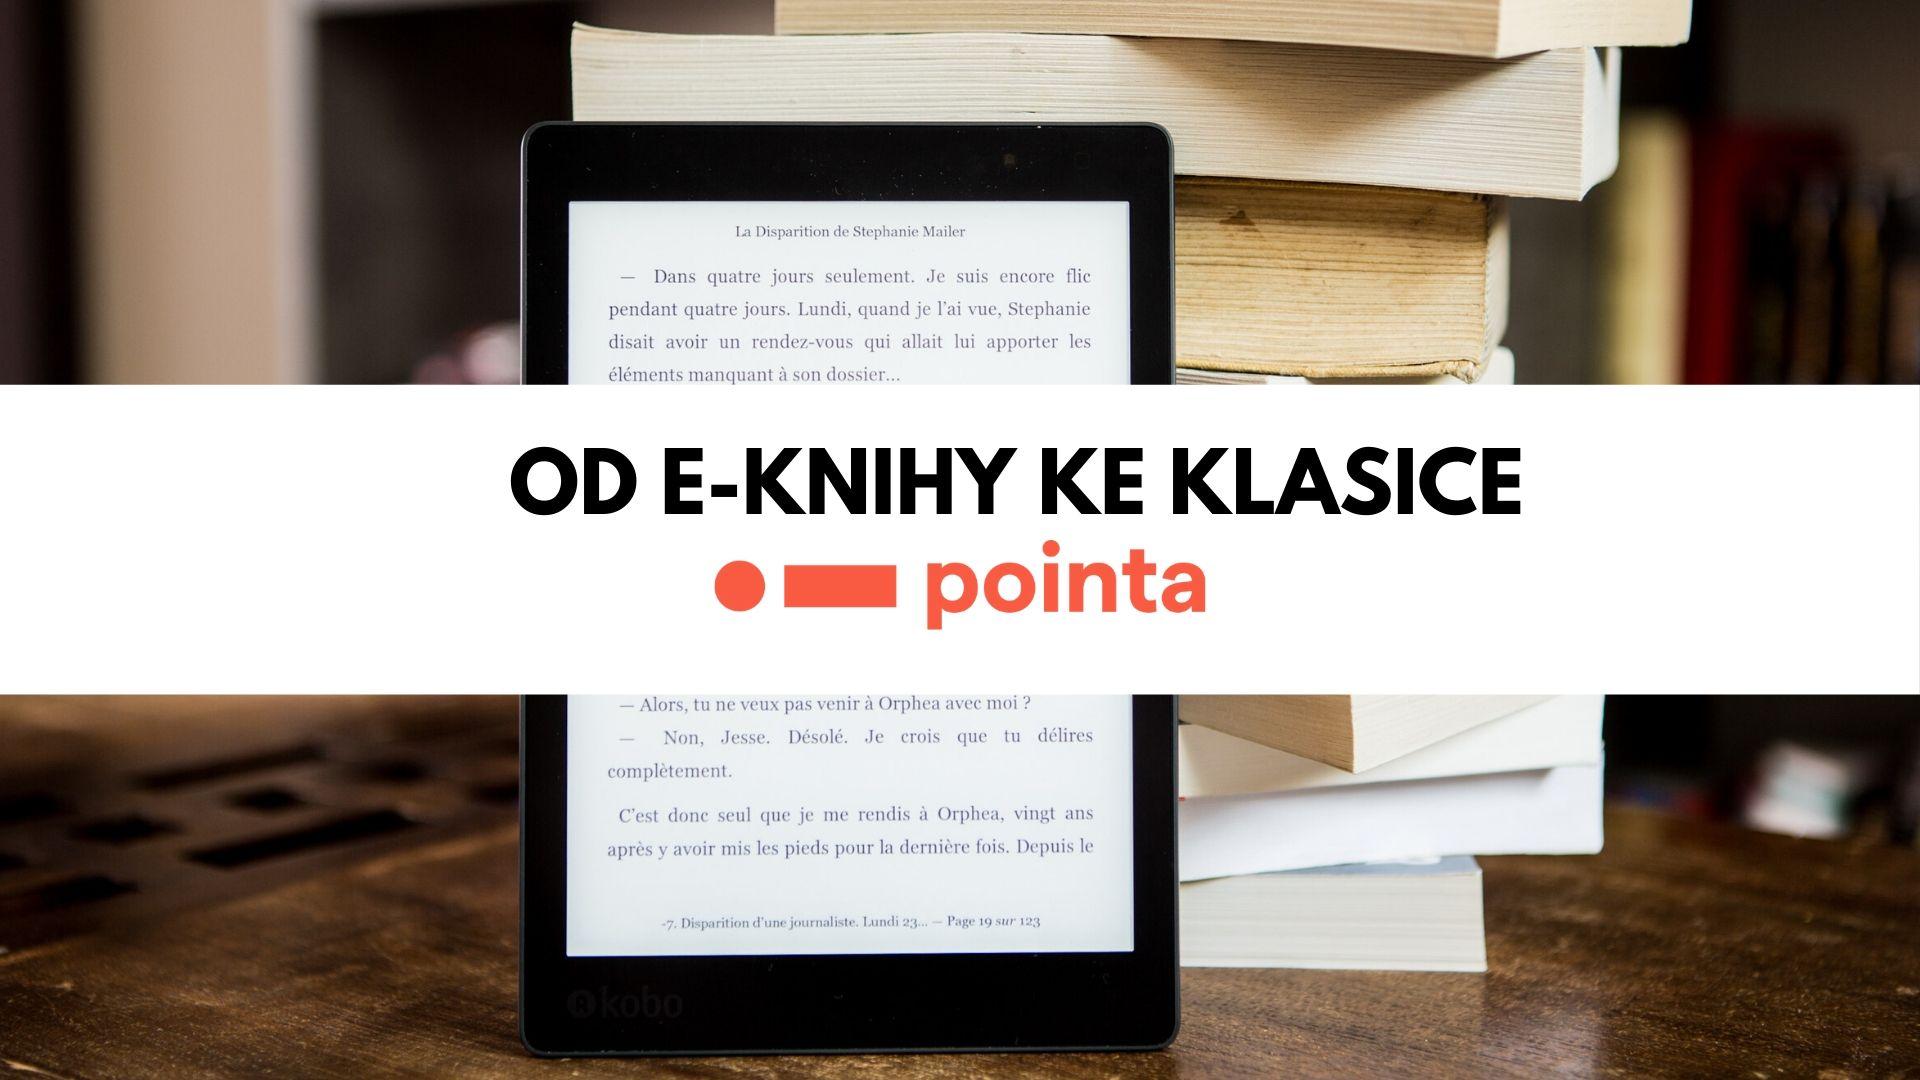 Od e-knihy ke klasice